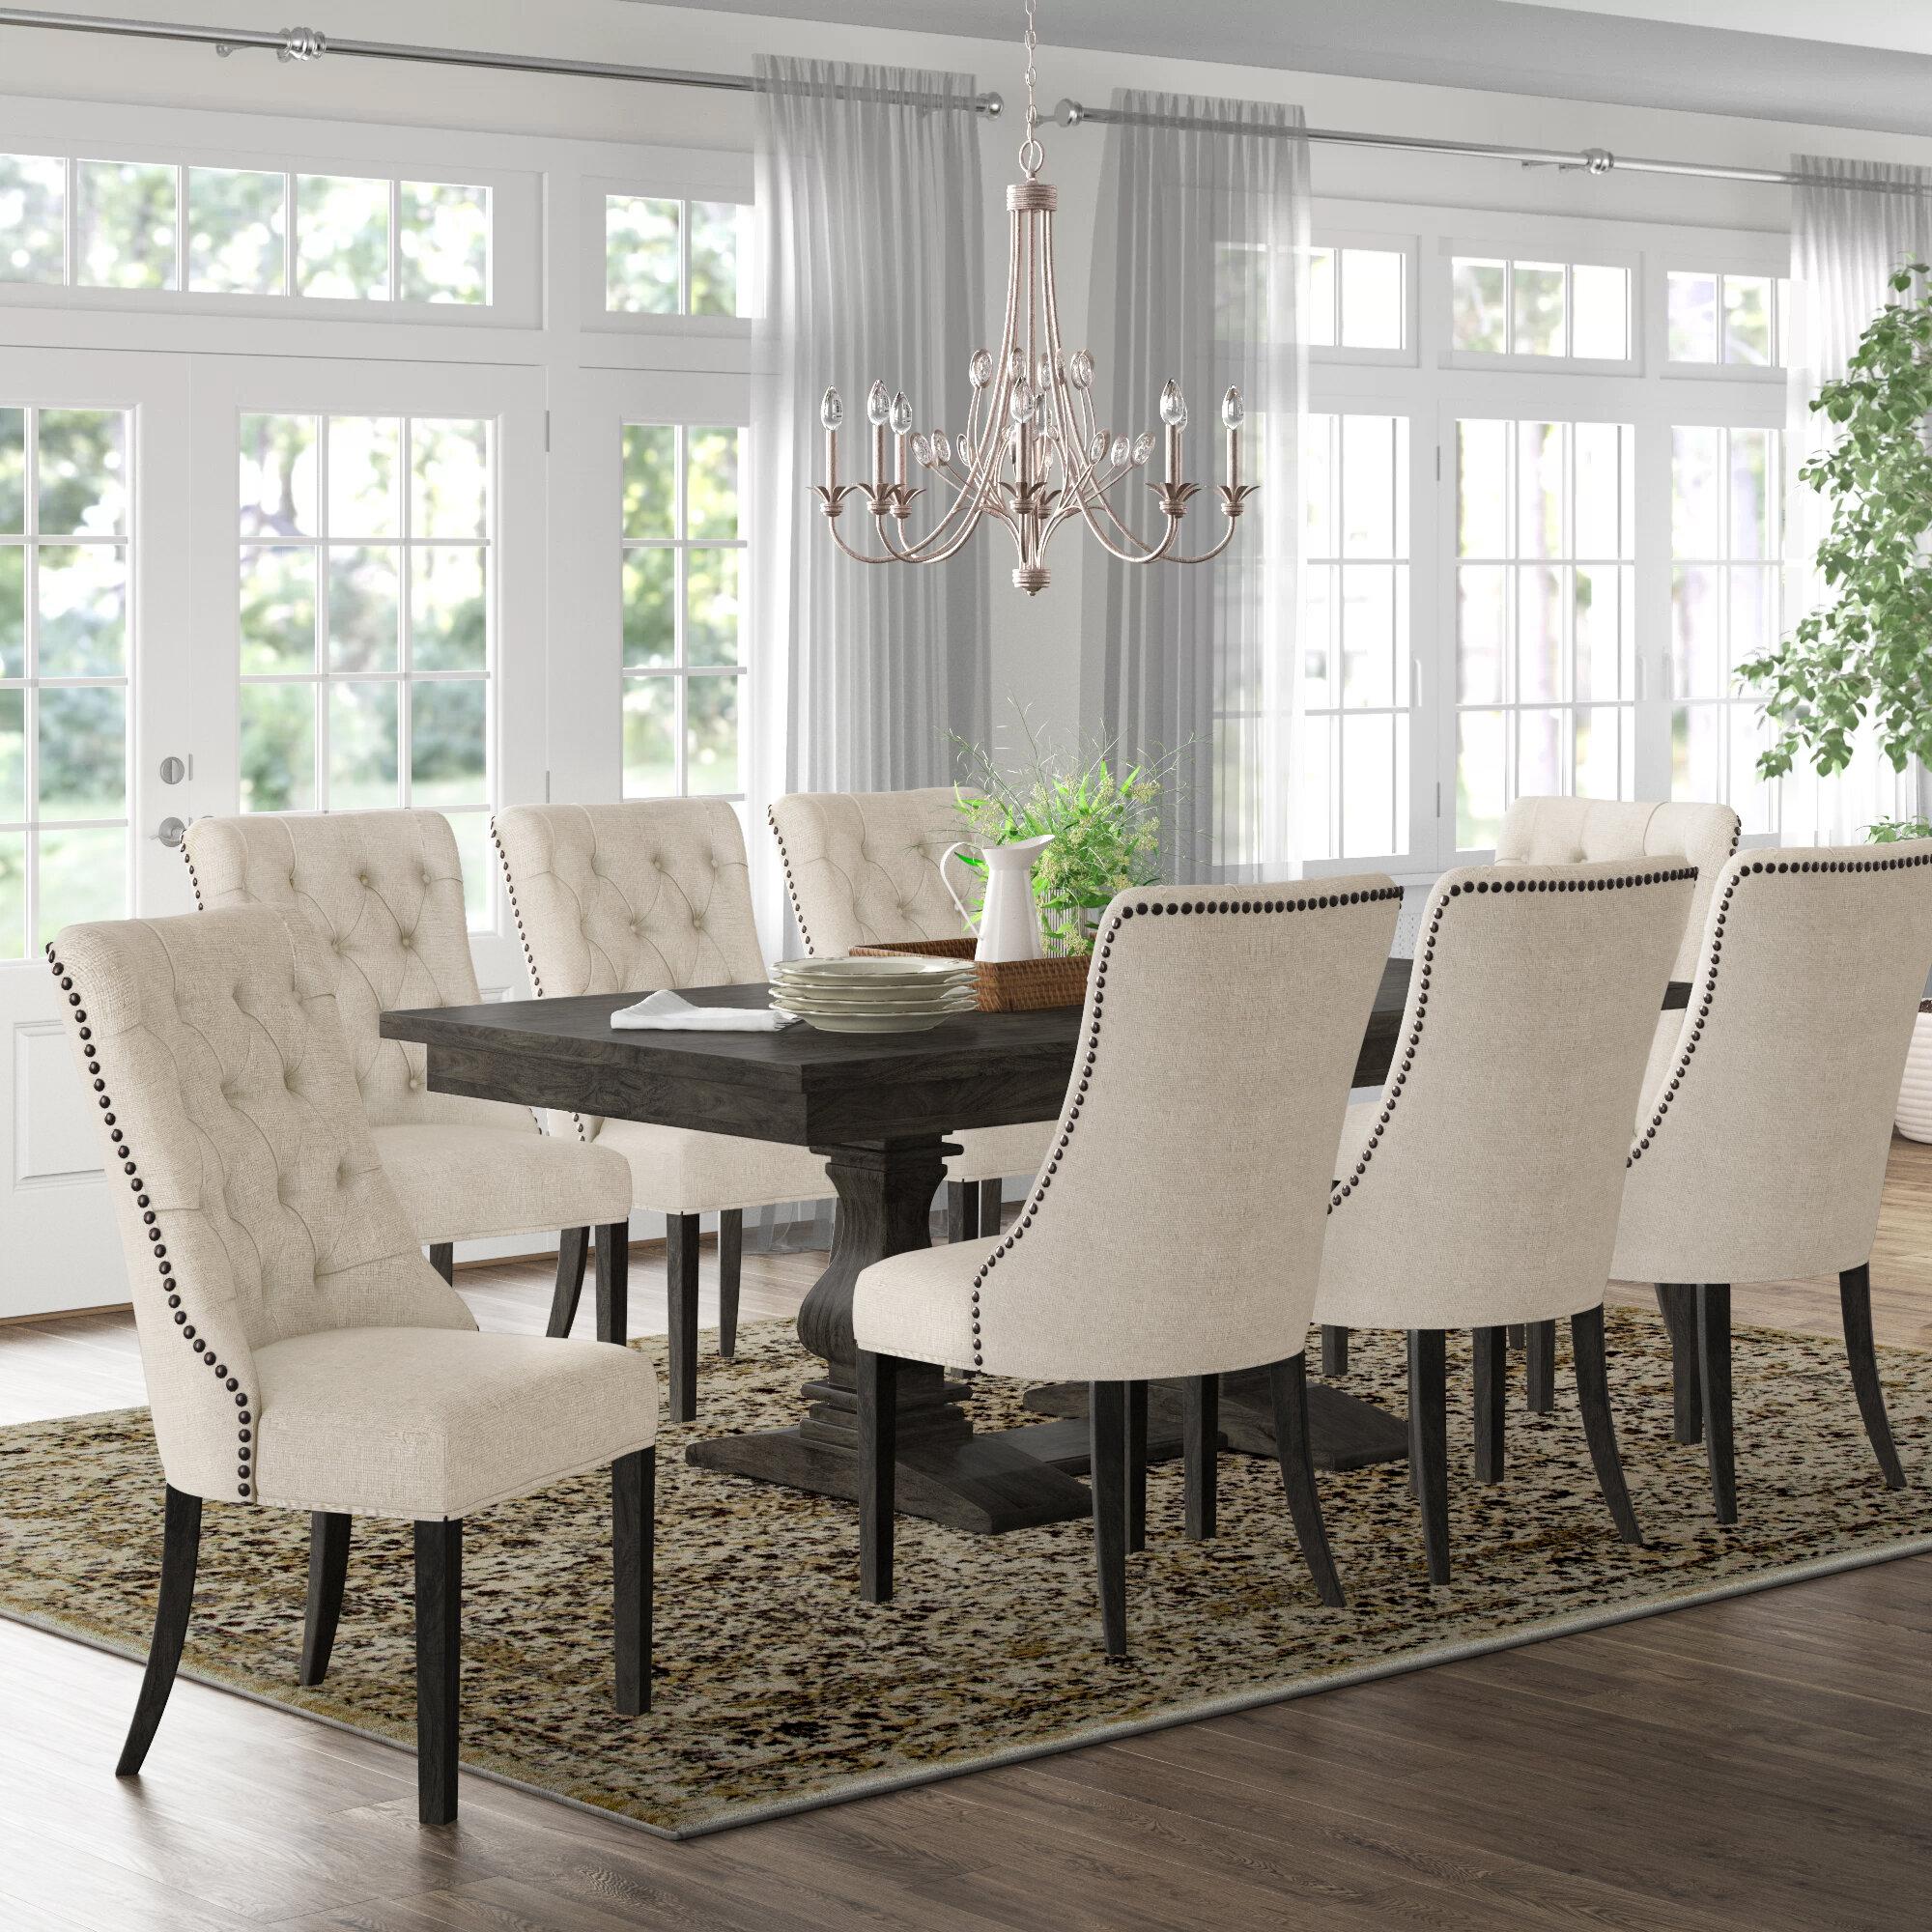 Lark Manor Glendale Heights Dining Set & Reviews   Wayfair